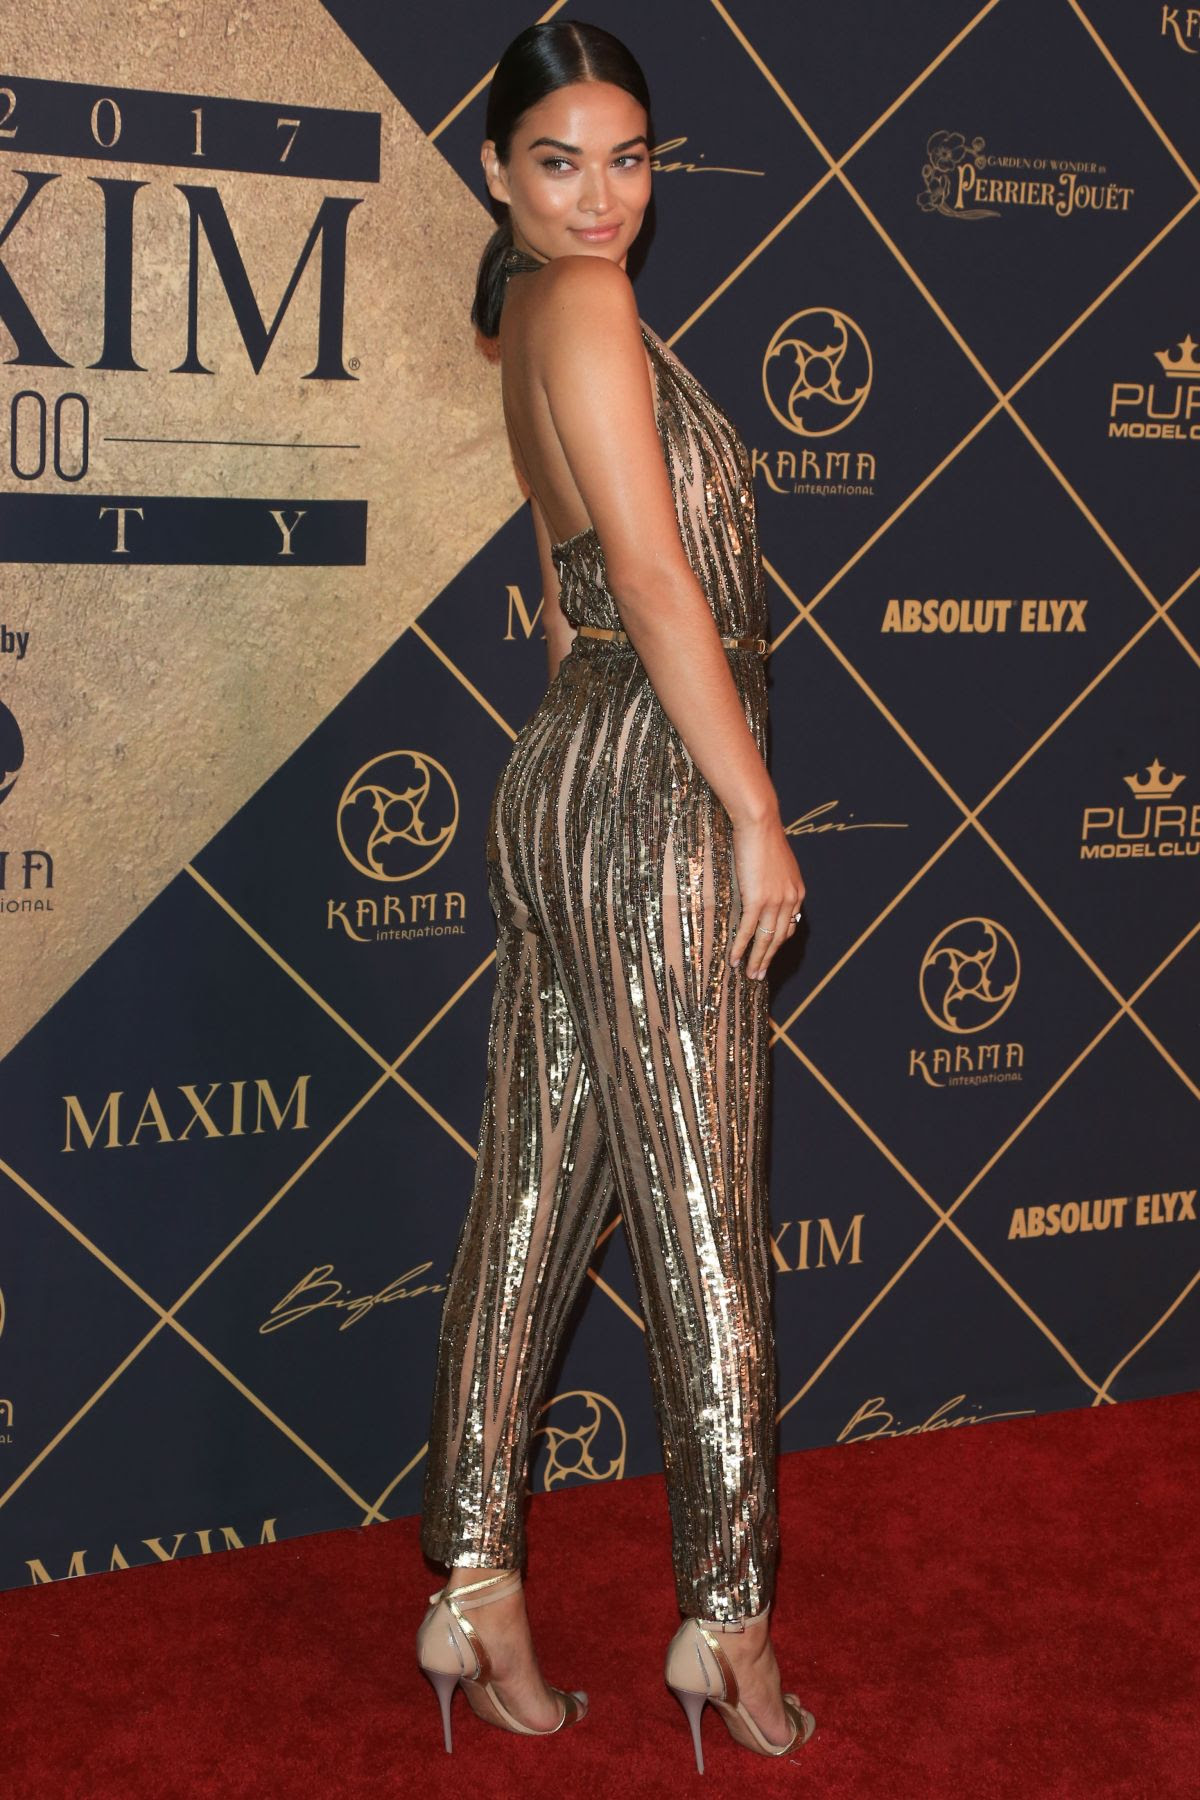 SHANINA SHAIK at Maxim Hot 100 Party in Hollywood 06/24/2017